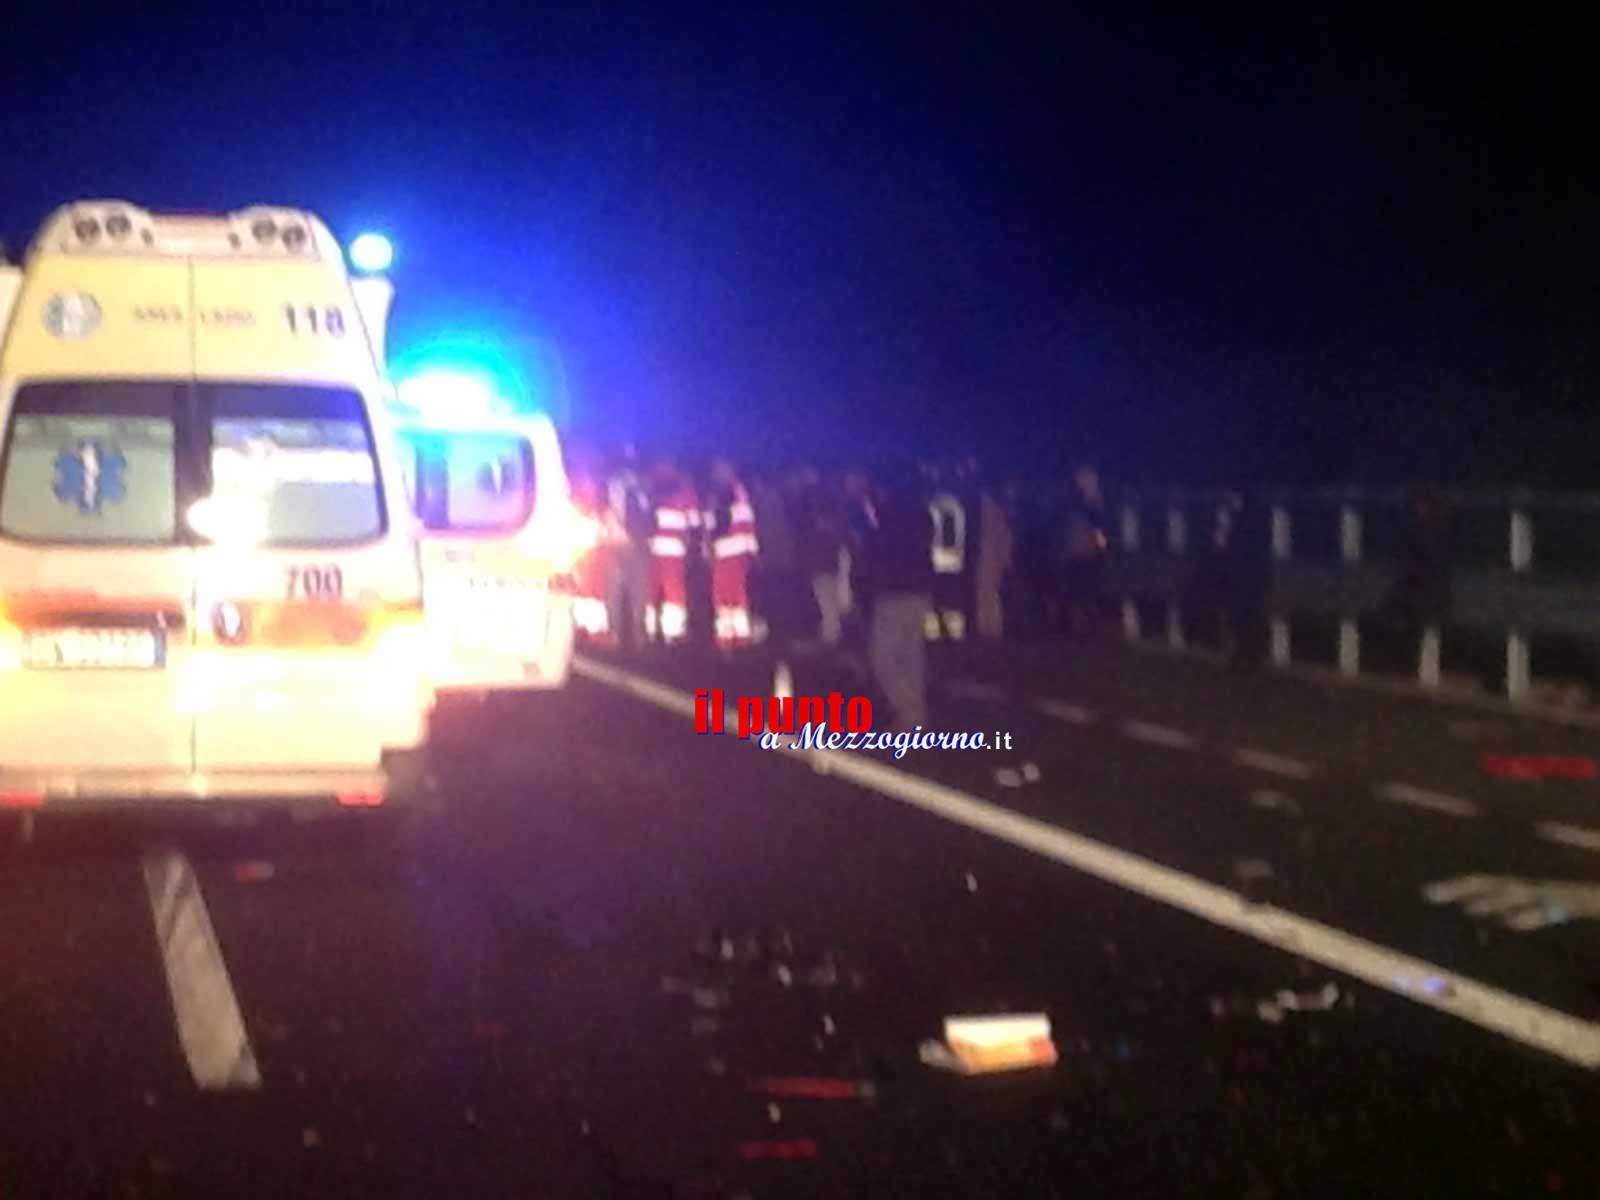 Tragedia sull'A1, camion fa strike tra mezzi incidentati tra cui pullman di turisti